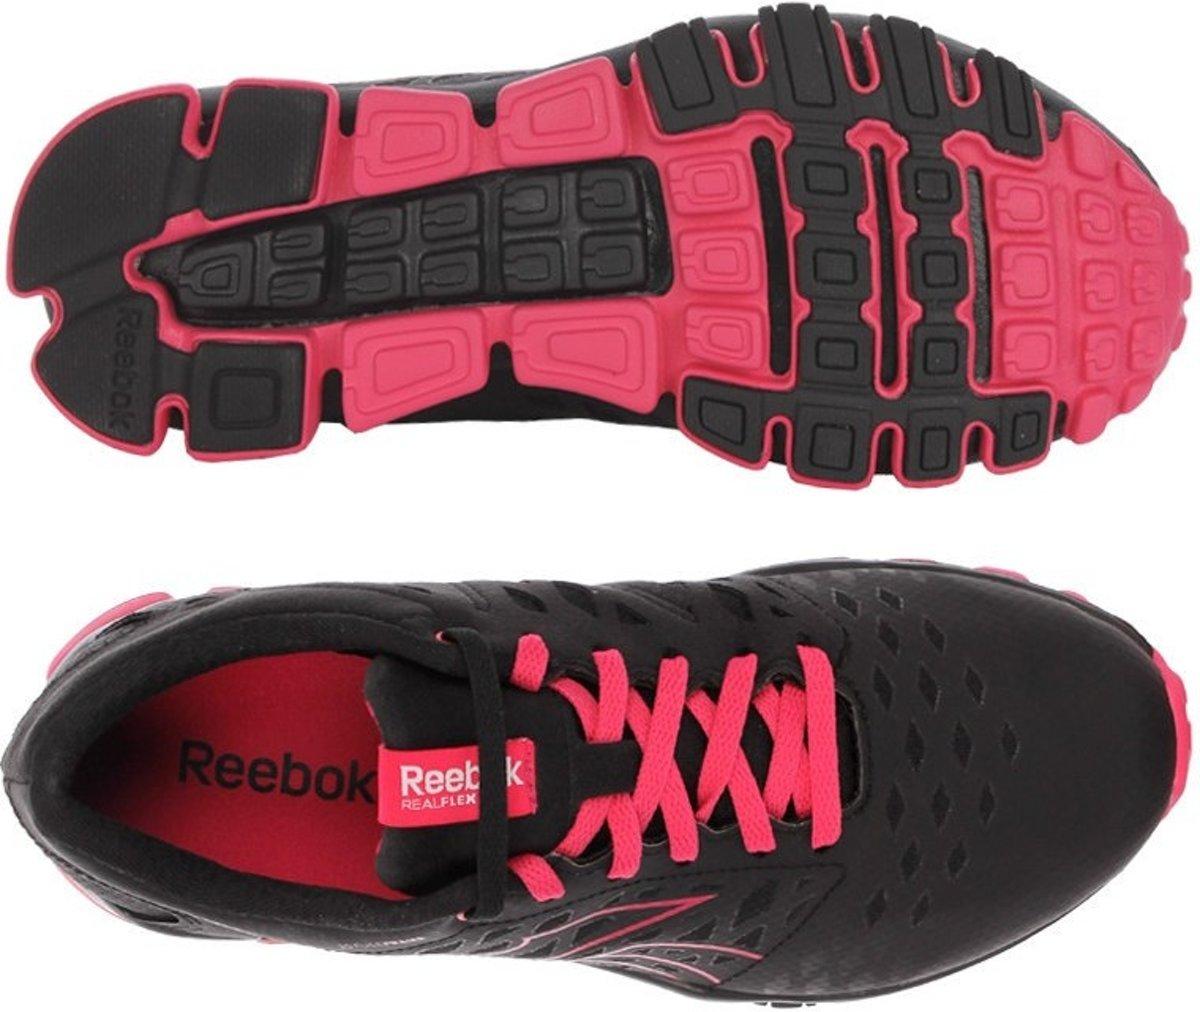 Femmes Reebok Realflex Fusion Chaussures De Course Noir Taille 37.5 pwJ8Xkjnn